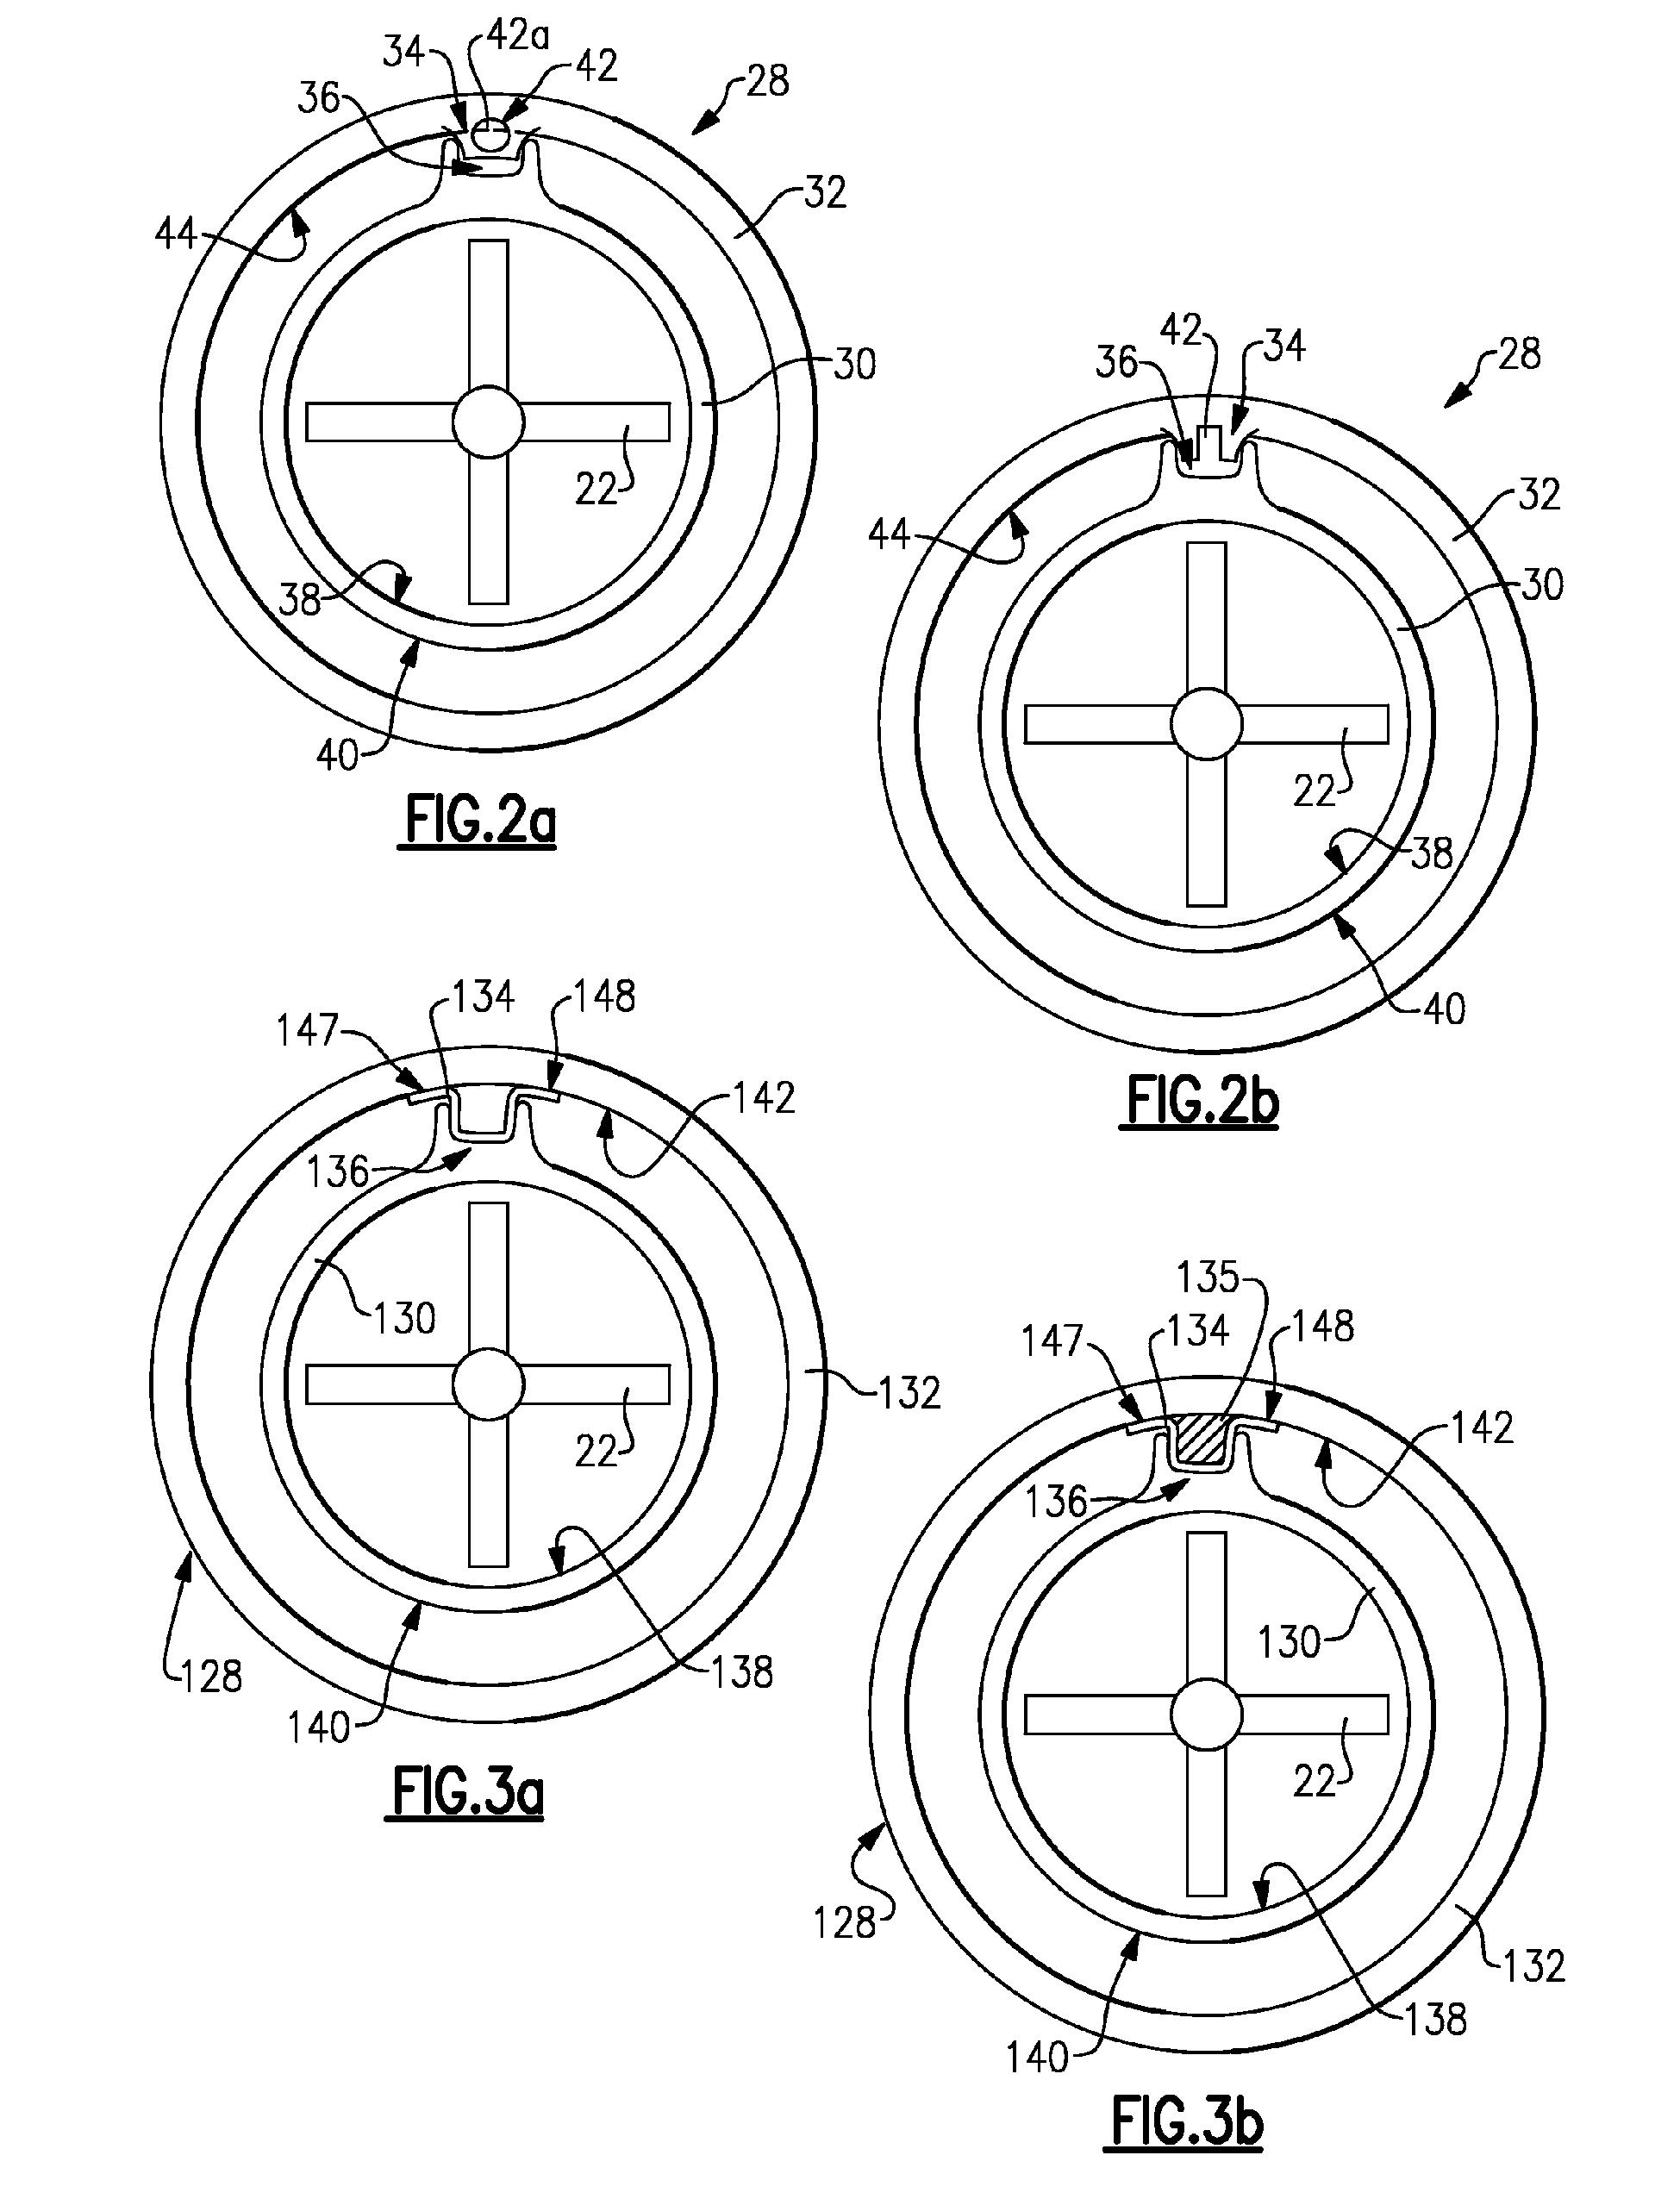 "براءة اÙ""Ø§Ø ØªØ±Ø§Ø¹ EP A2 Ceramic gas turbine shroud براءات"